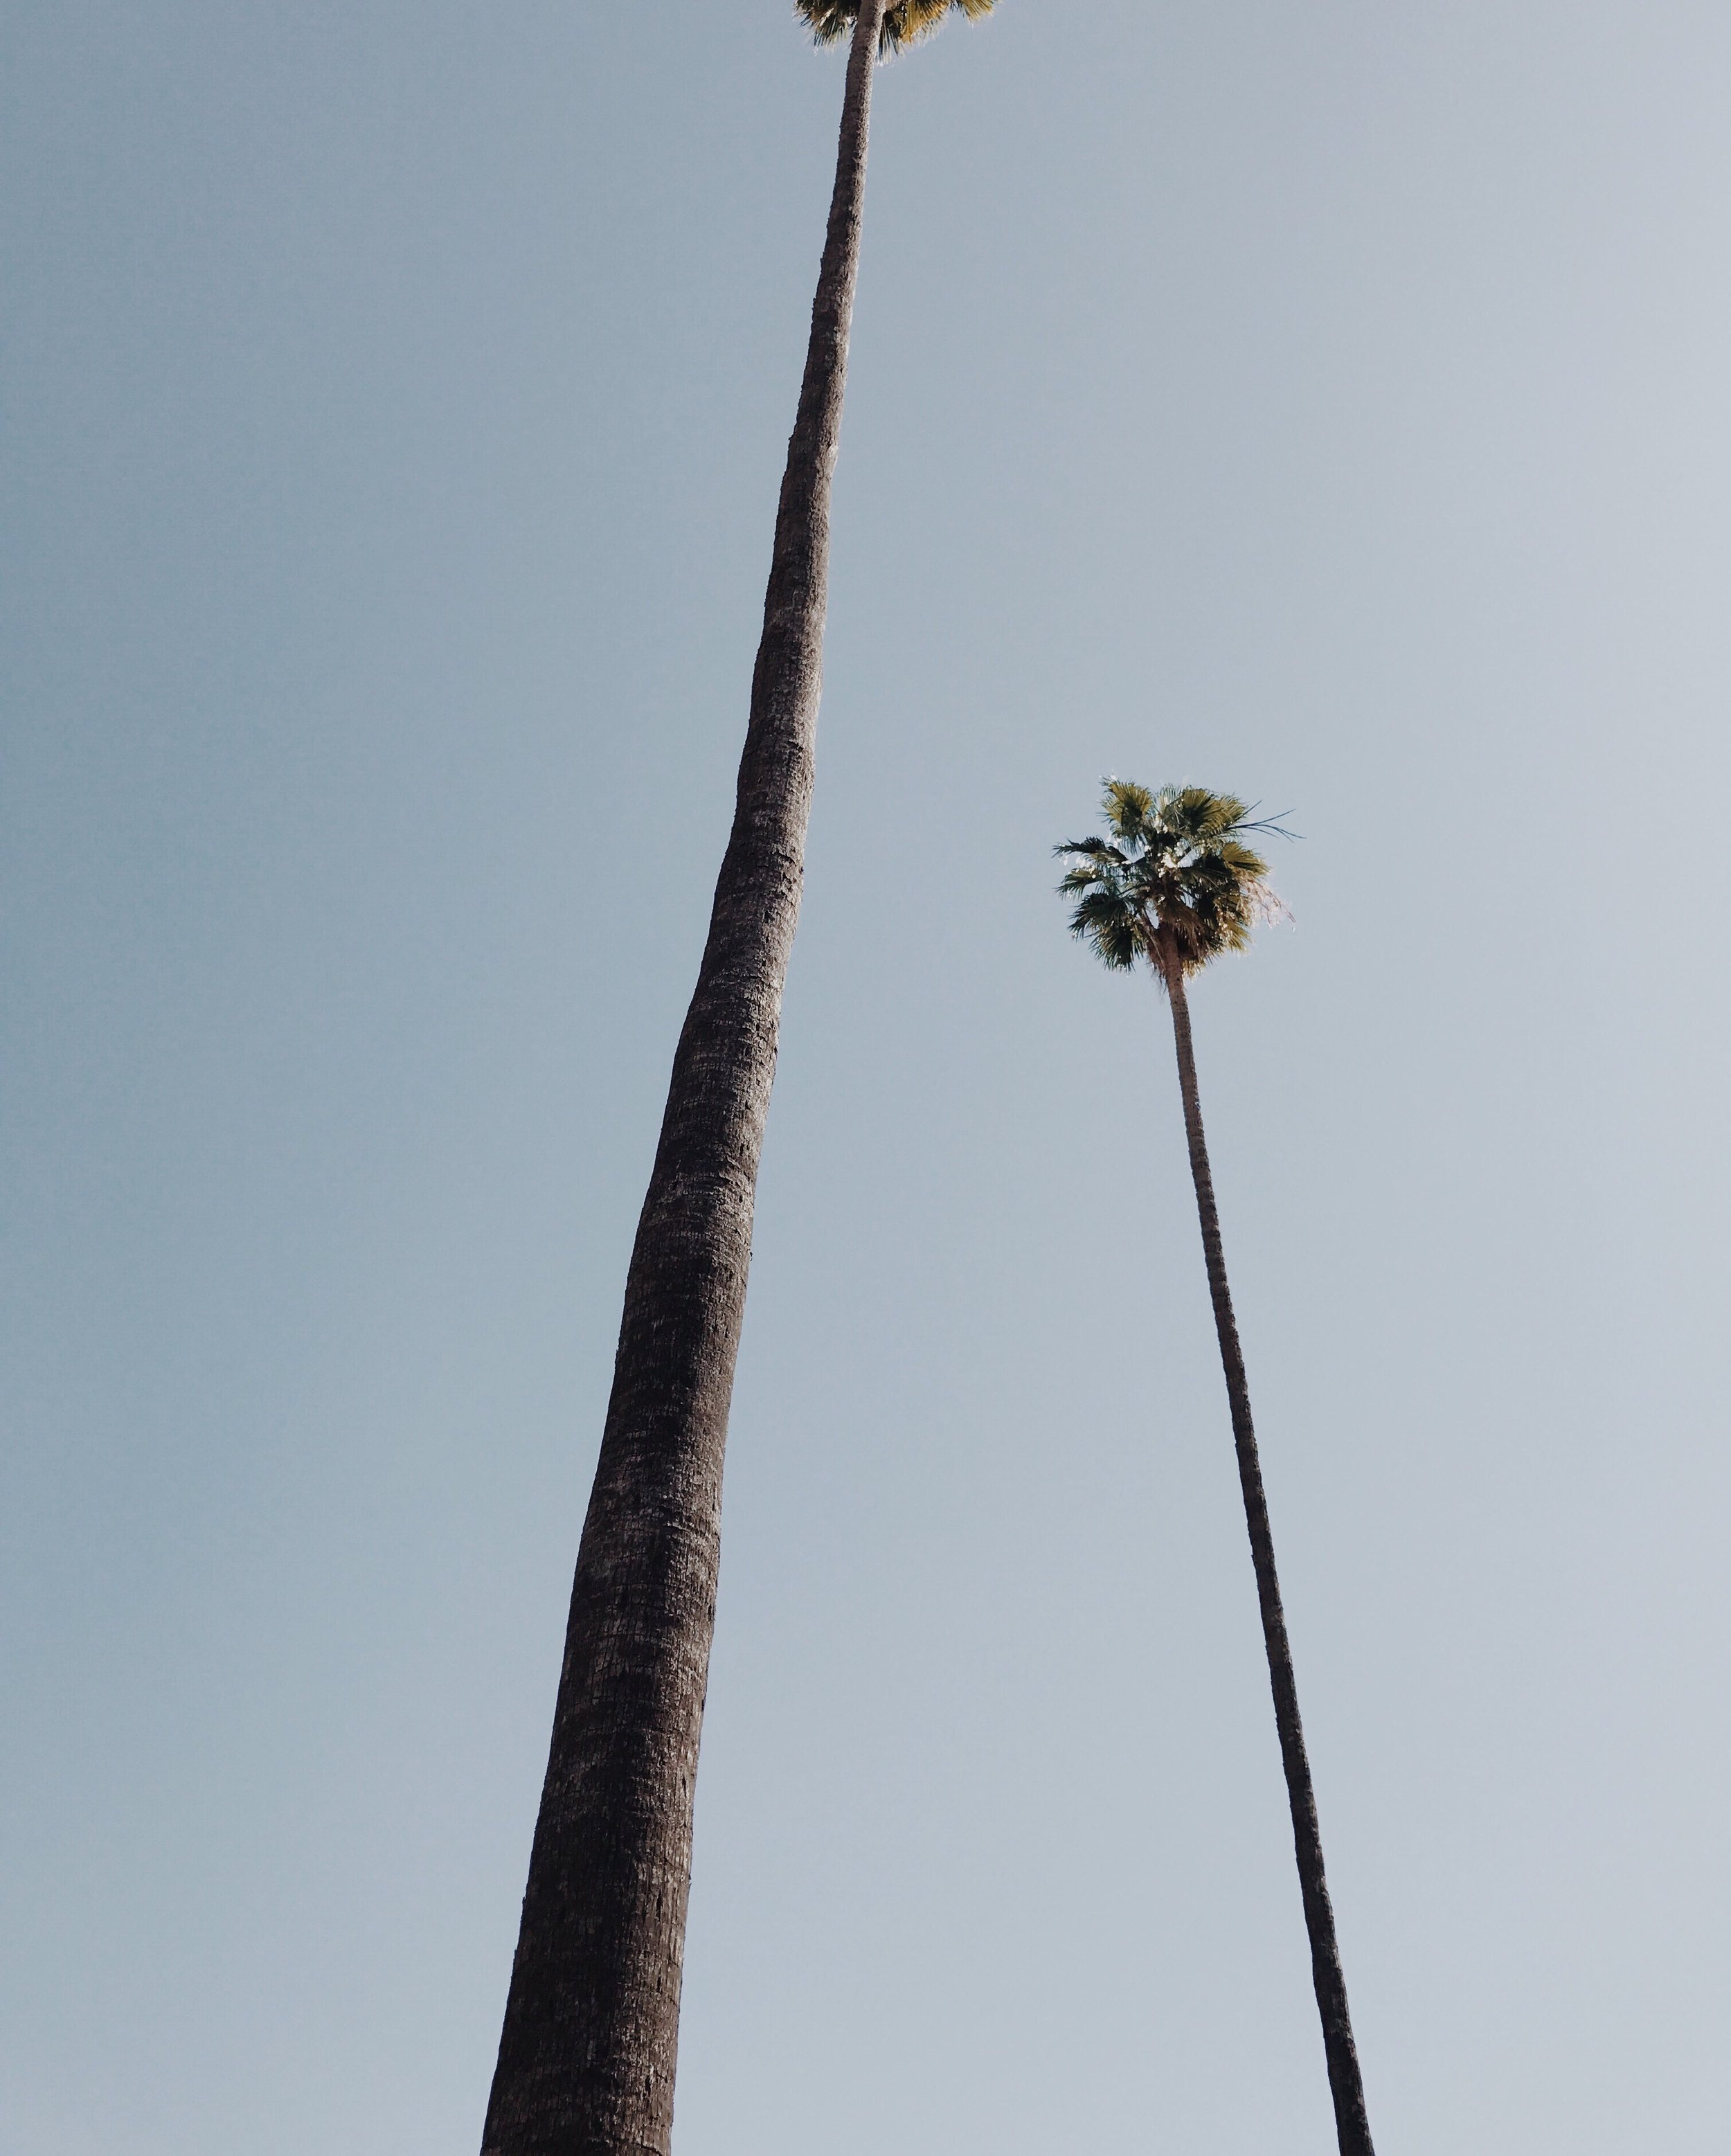 la_palmtrees_cali